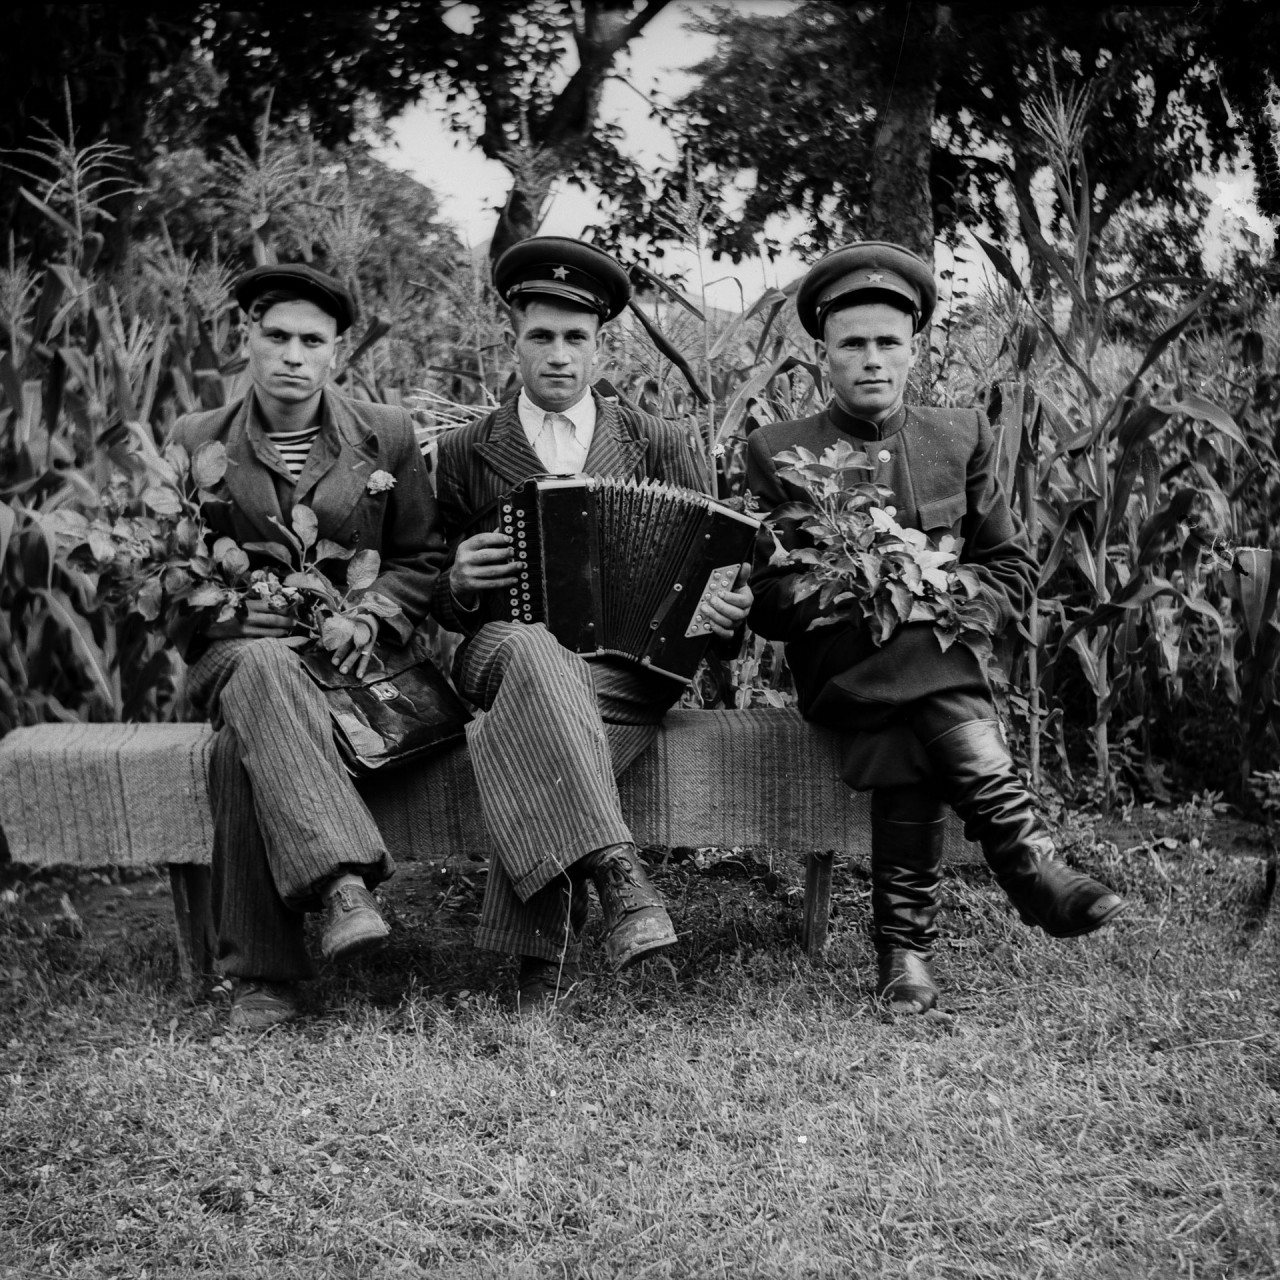 Архив сельского фотографа Захарии Кушнира (4)